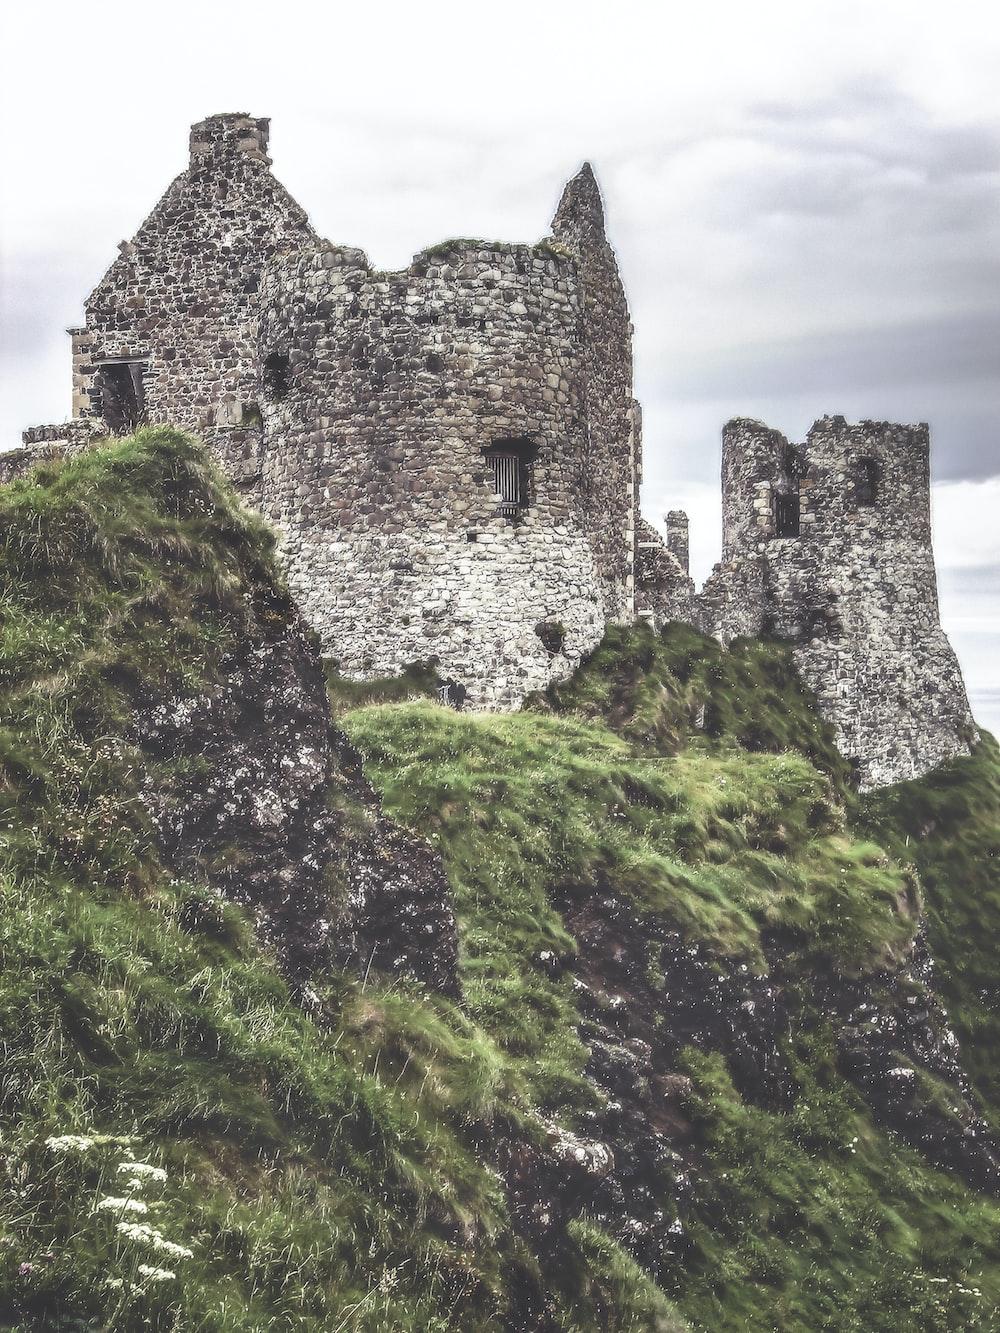 gray ruin house on top on mountain